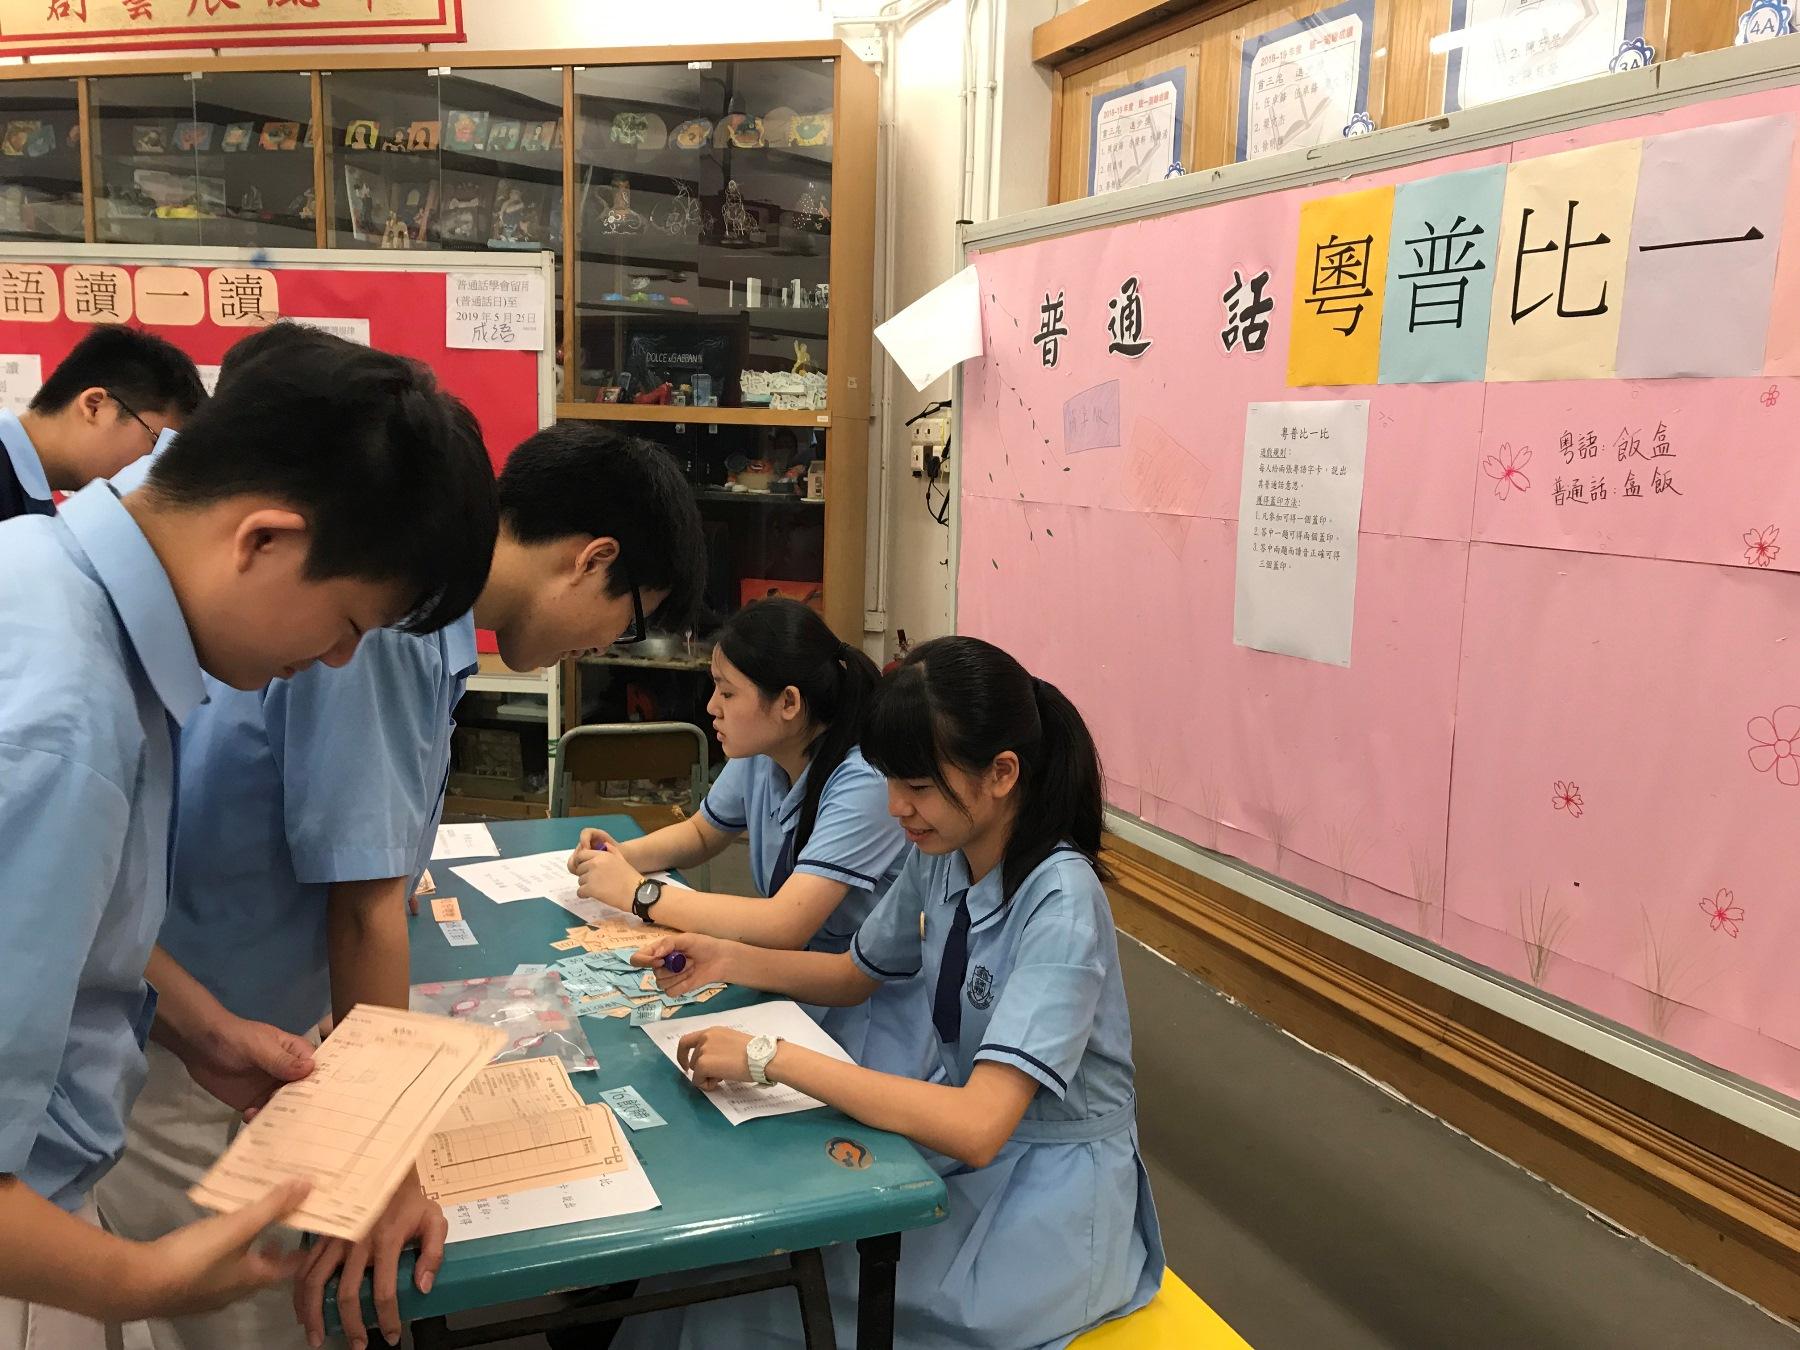 http://npc.edu.hk/sites/default/files/img_6450.jpg